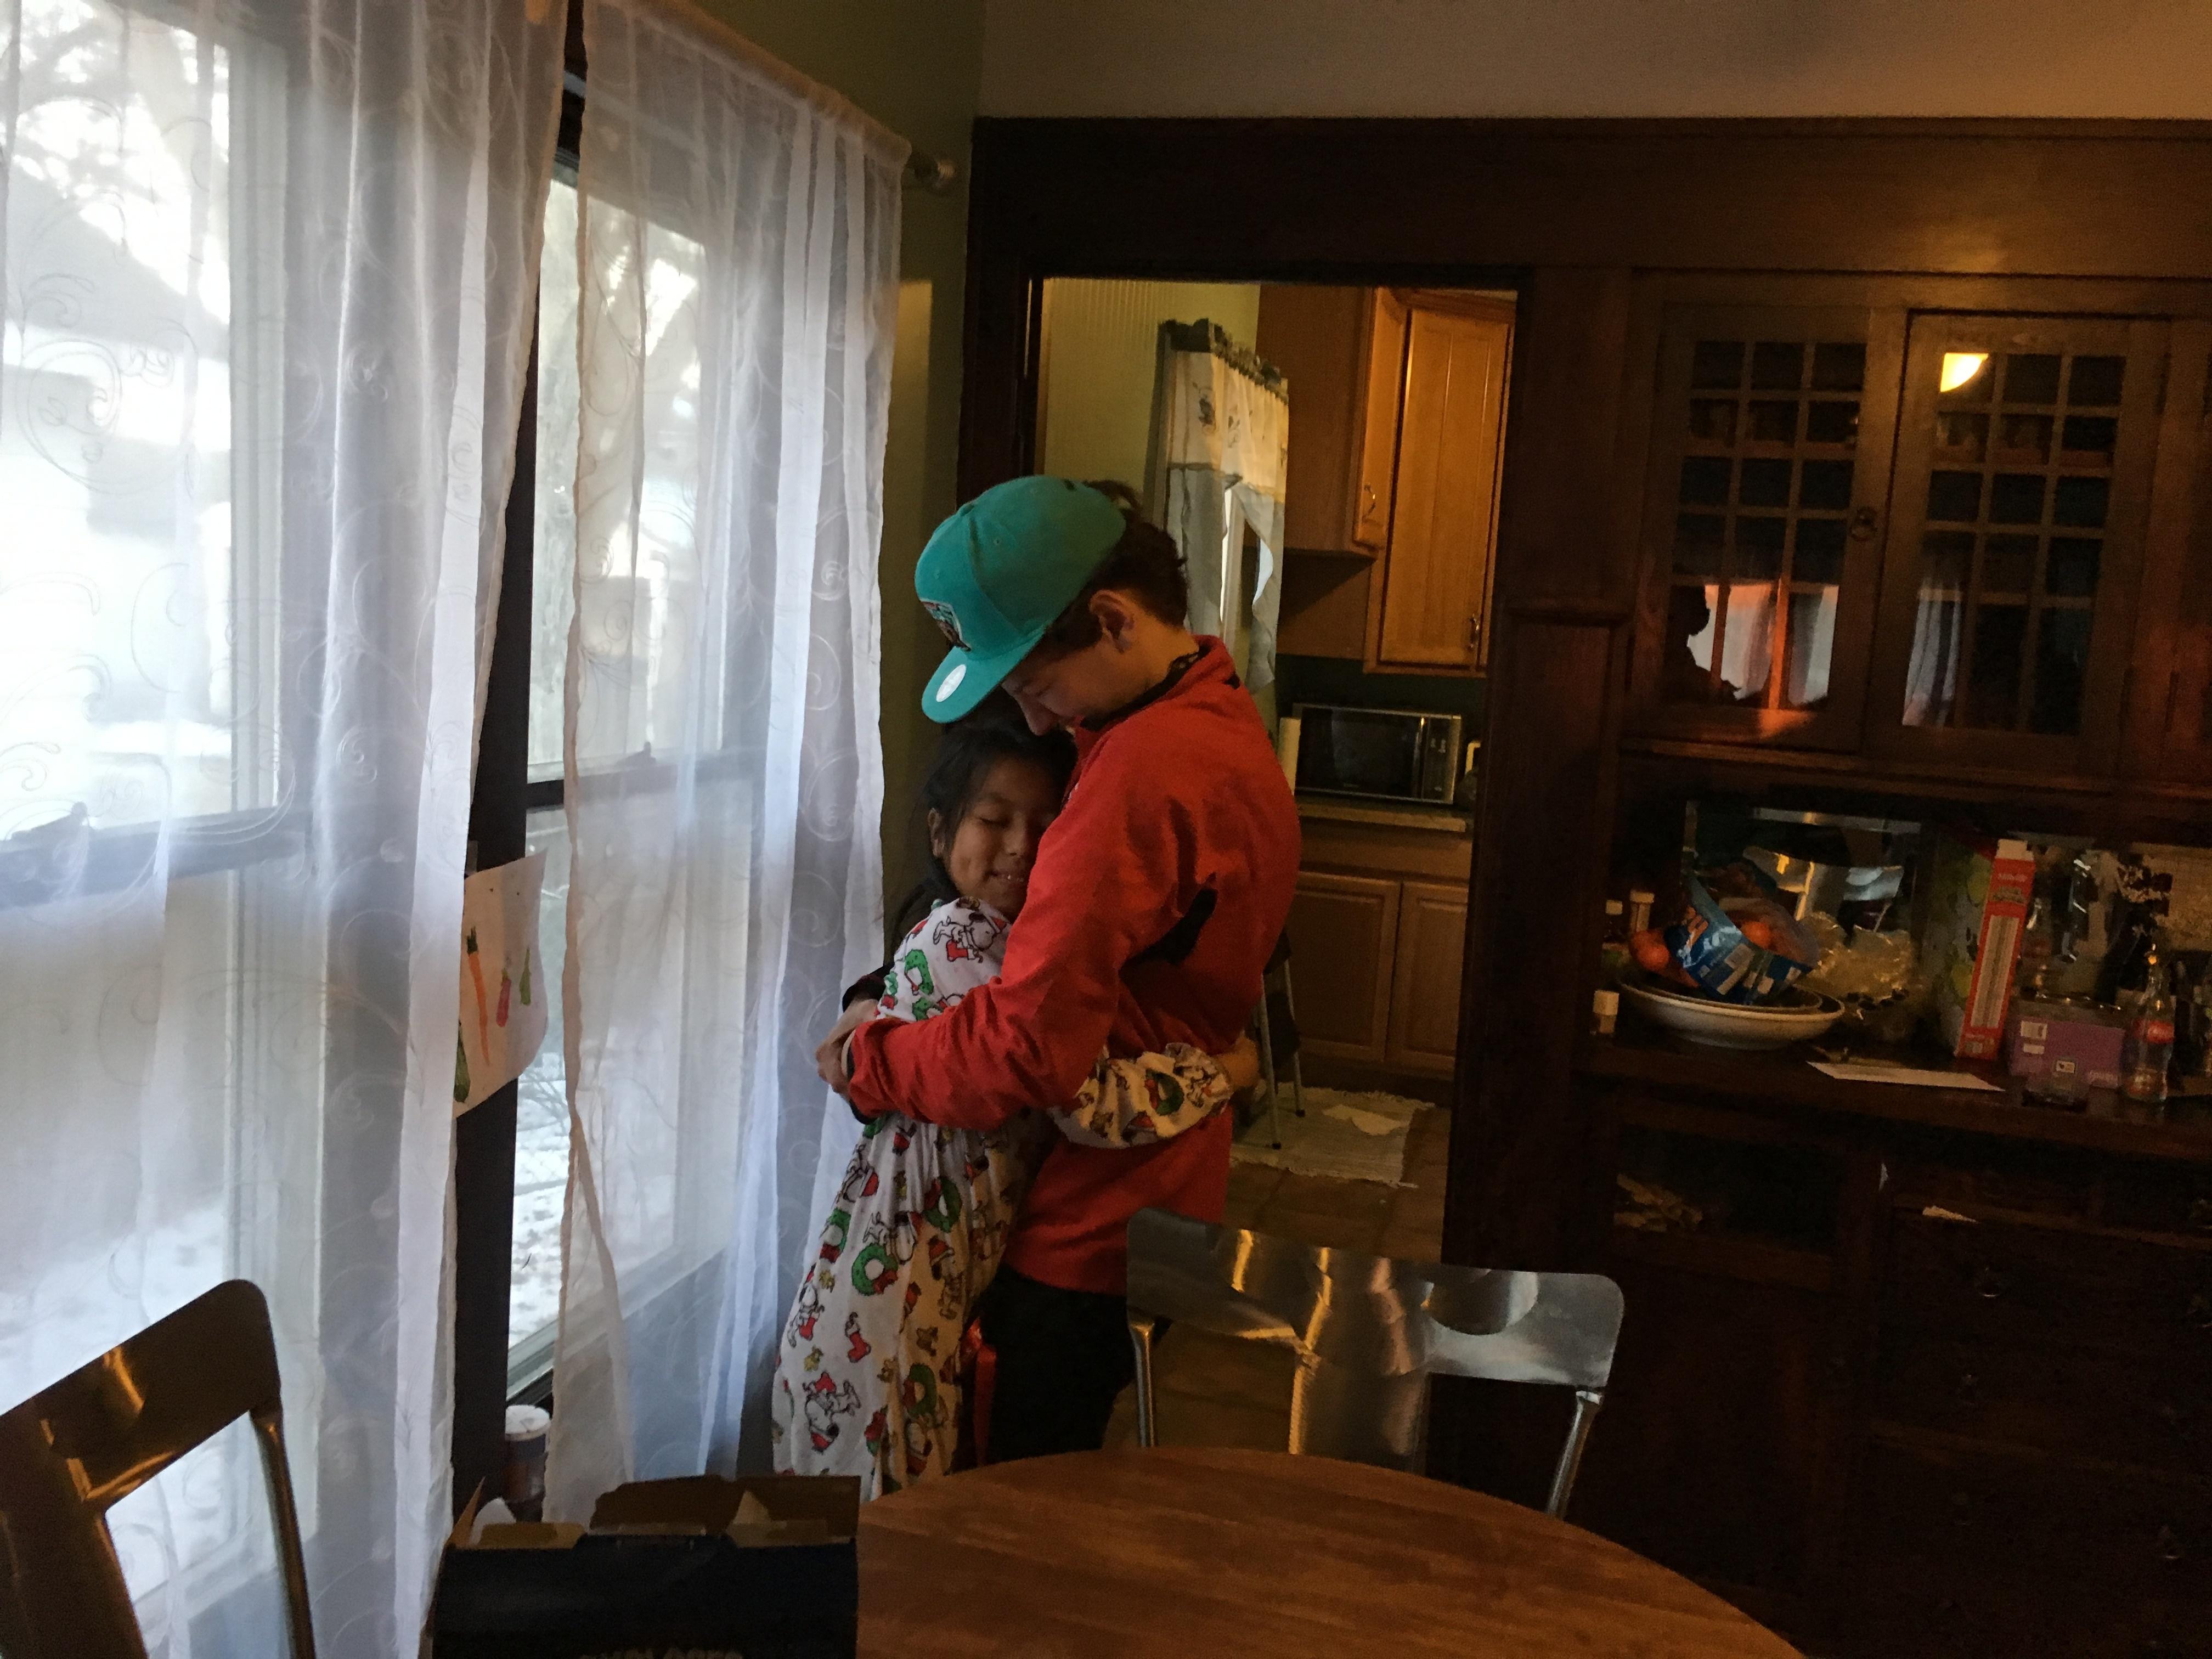 Armand Melk-Johnson, 15, hugs his host sister, Mariel, goodbye.